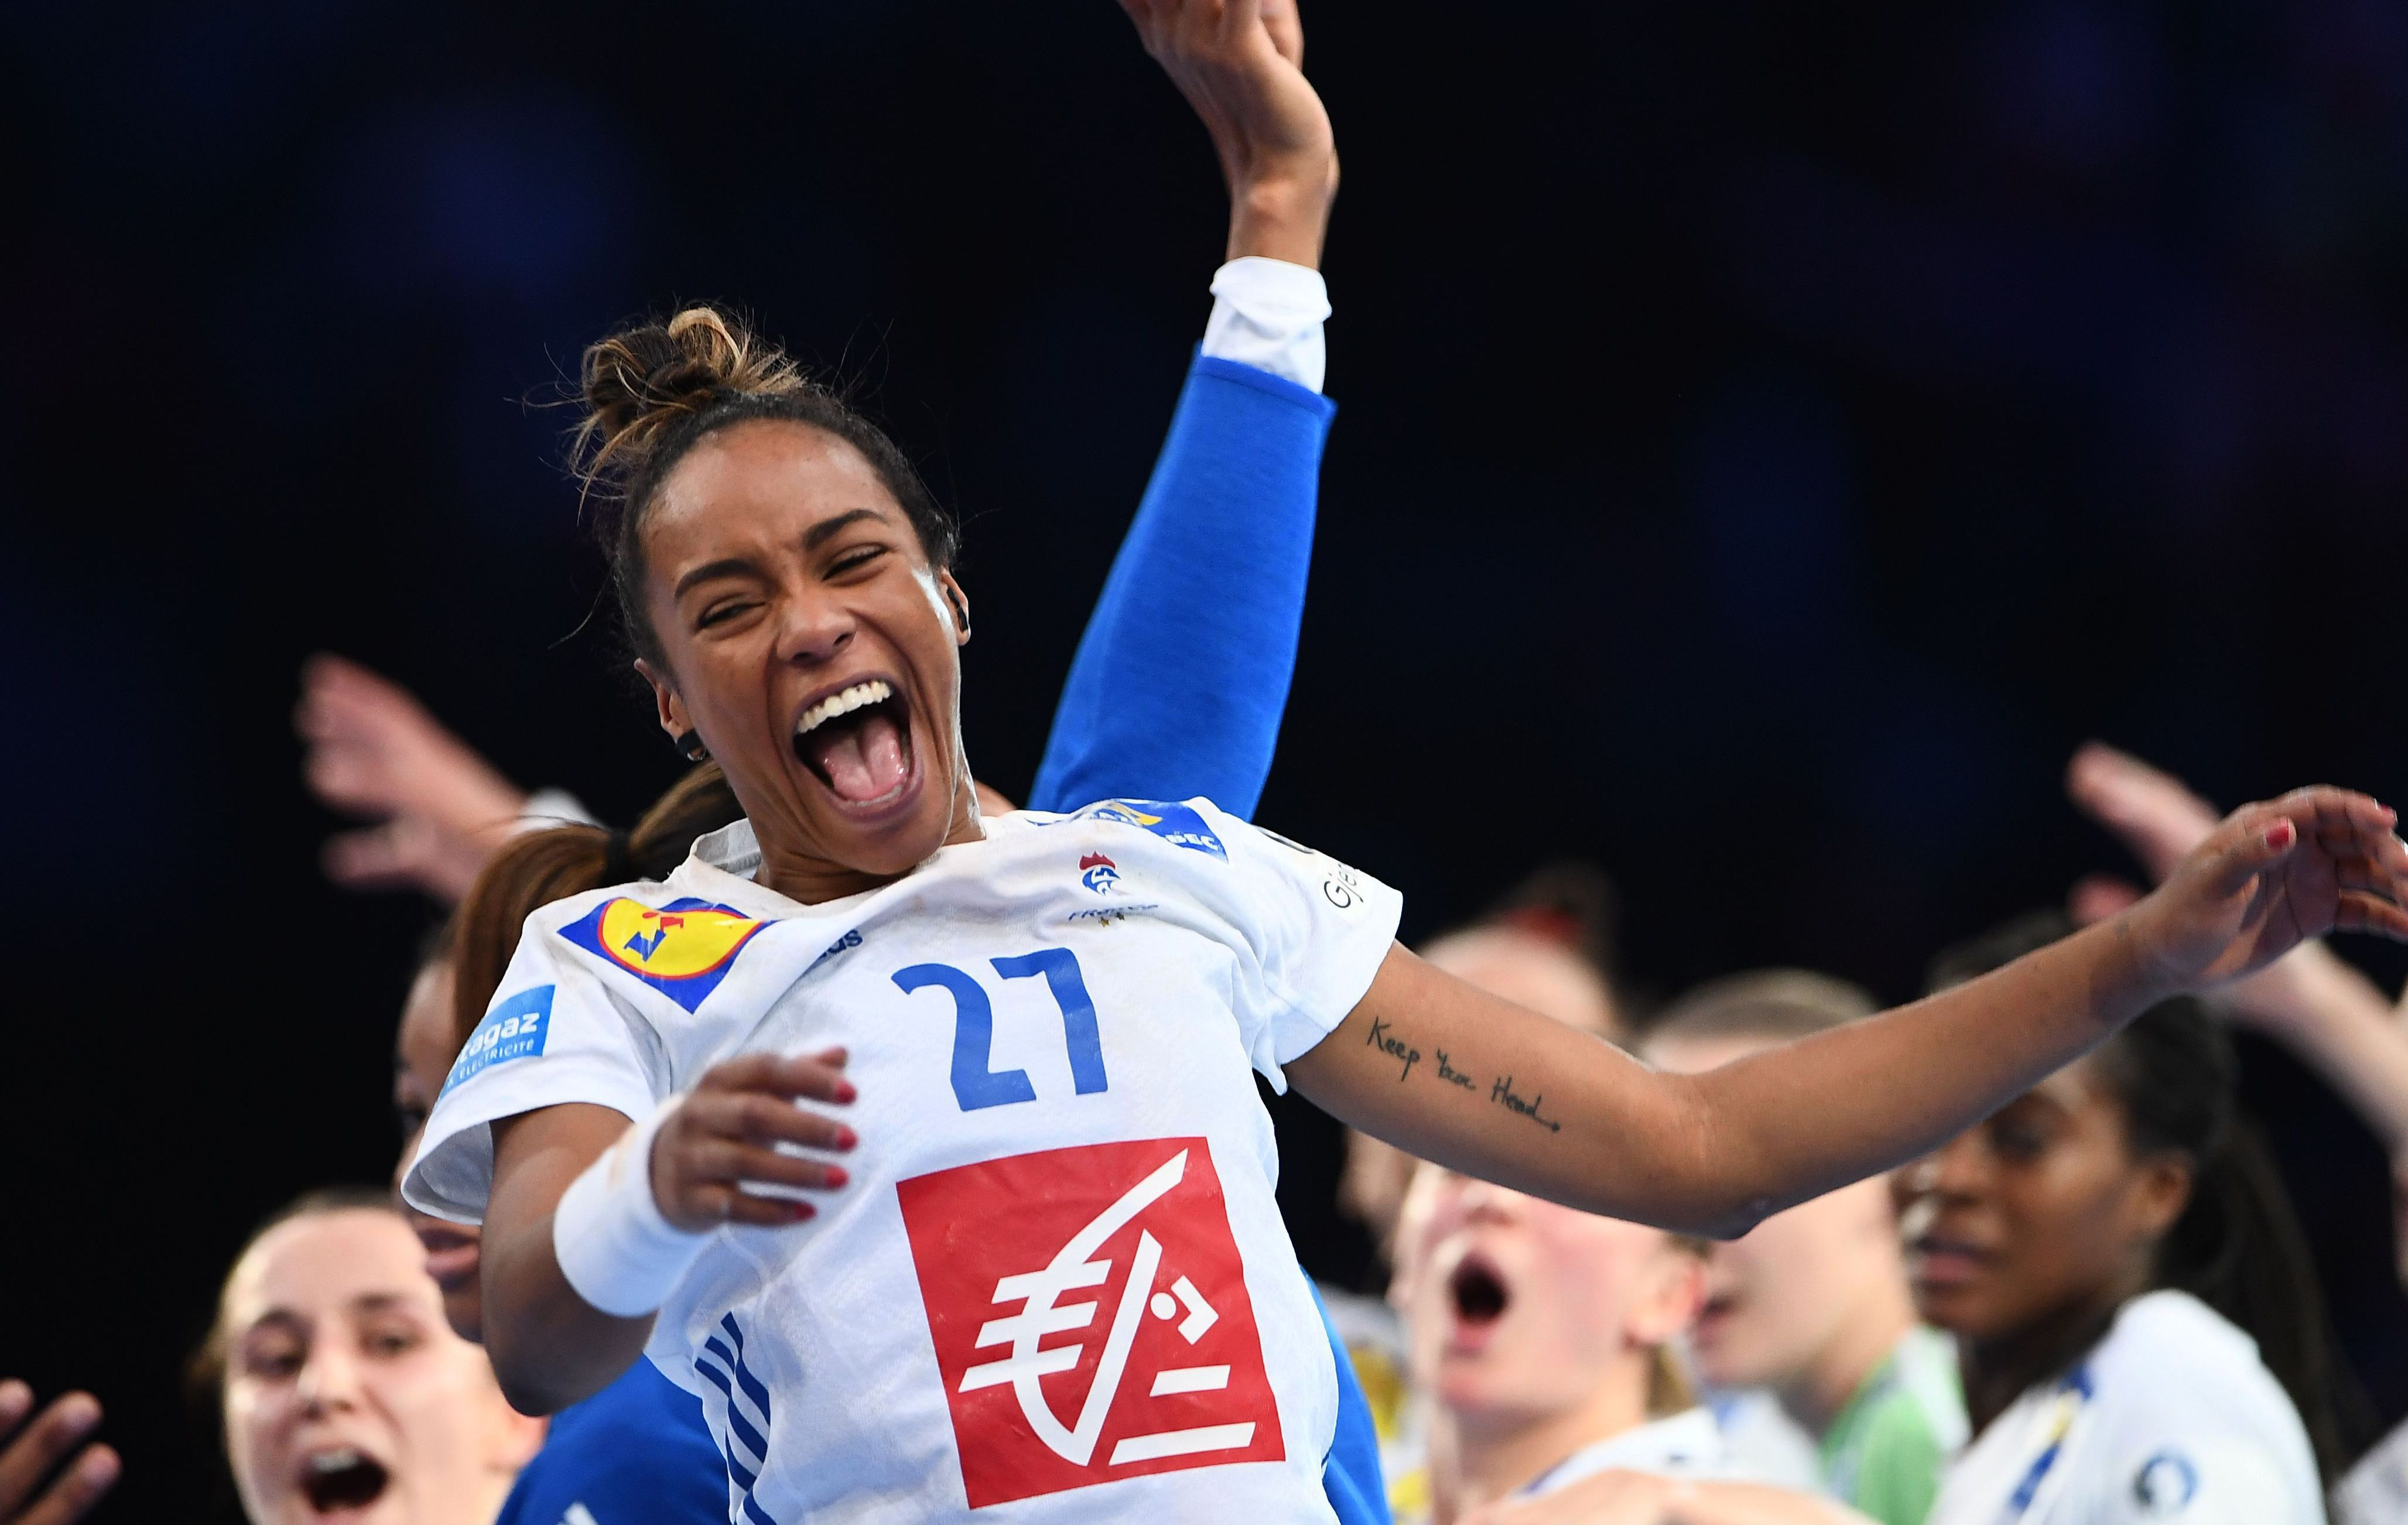 15485cc220cf1 Estelle Nze Minko : «On a progressé durant cet Euro» - Equipe de France -  Handball